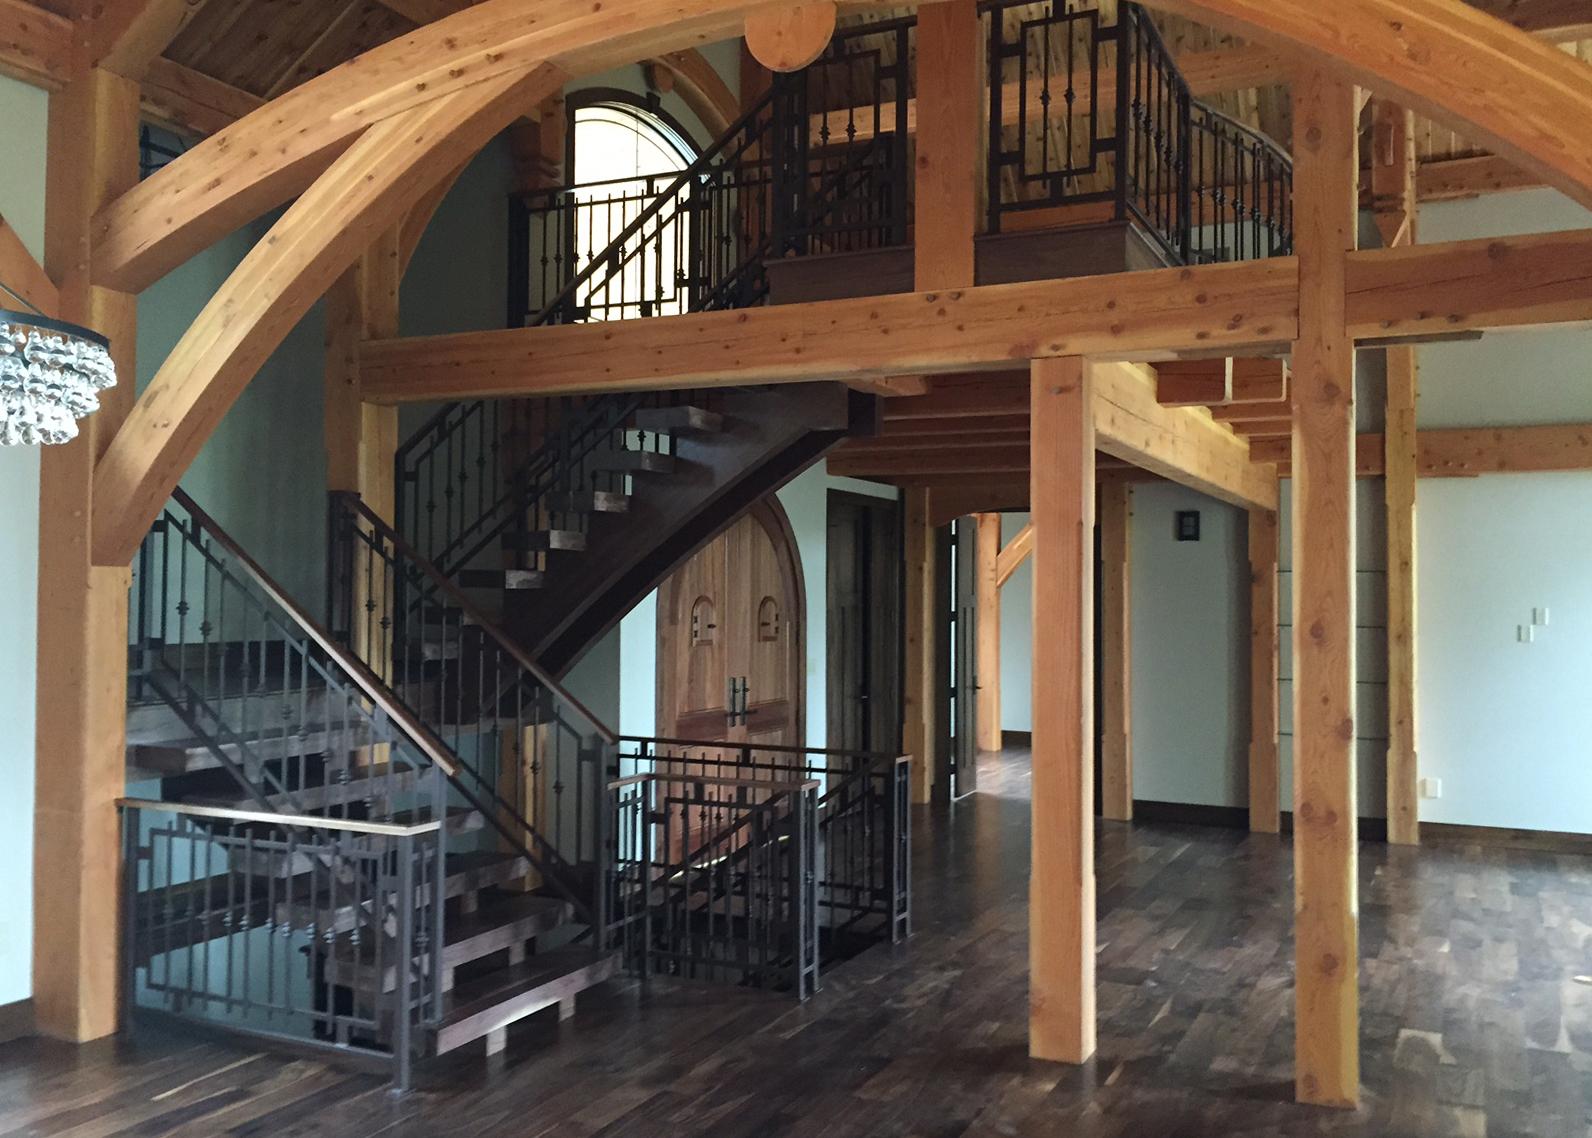 custom-steel-railing-stairway-modern-cabin-iowa-2015